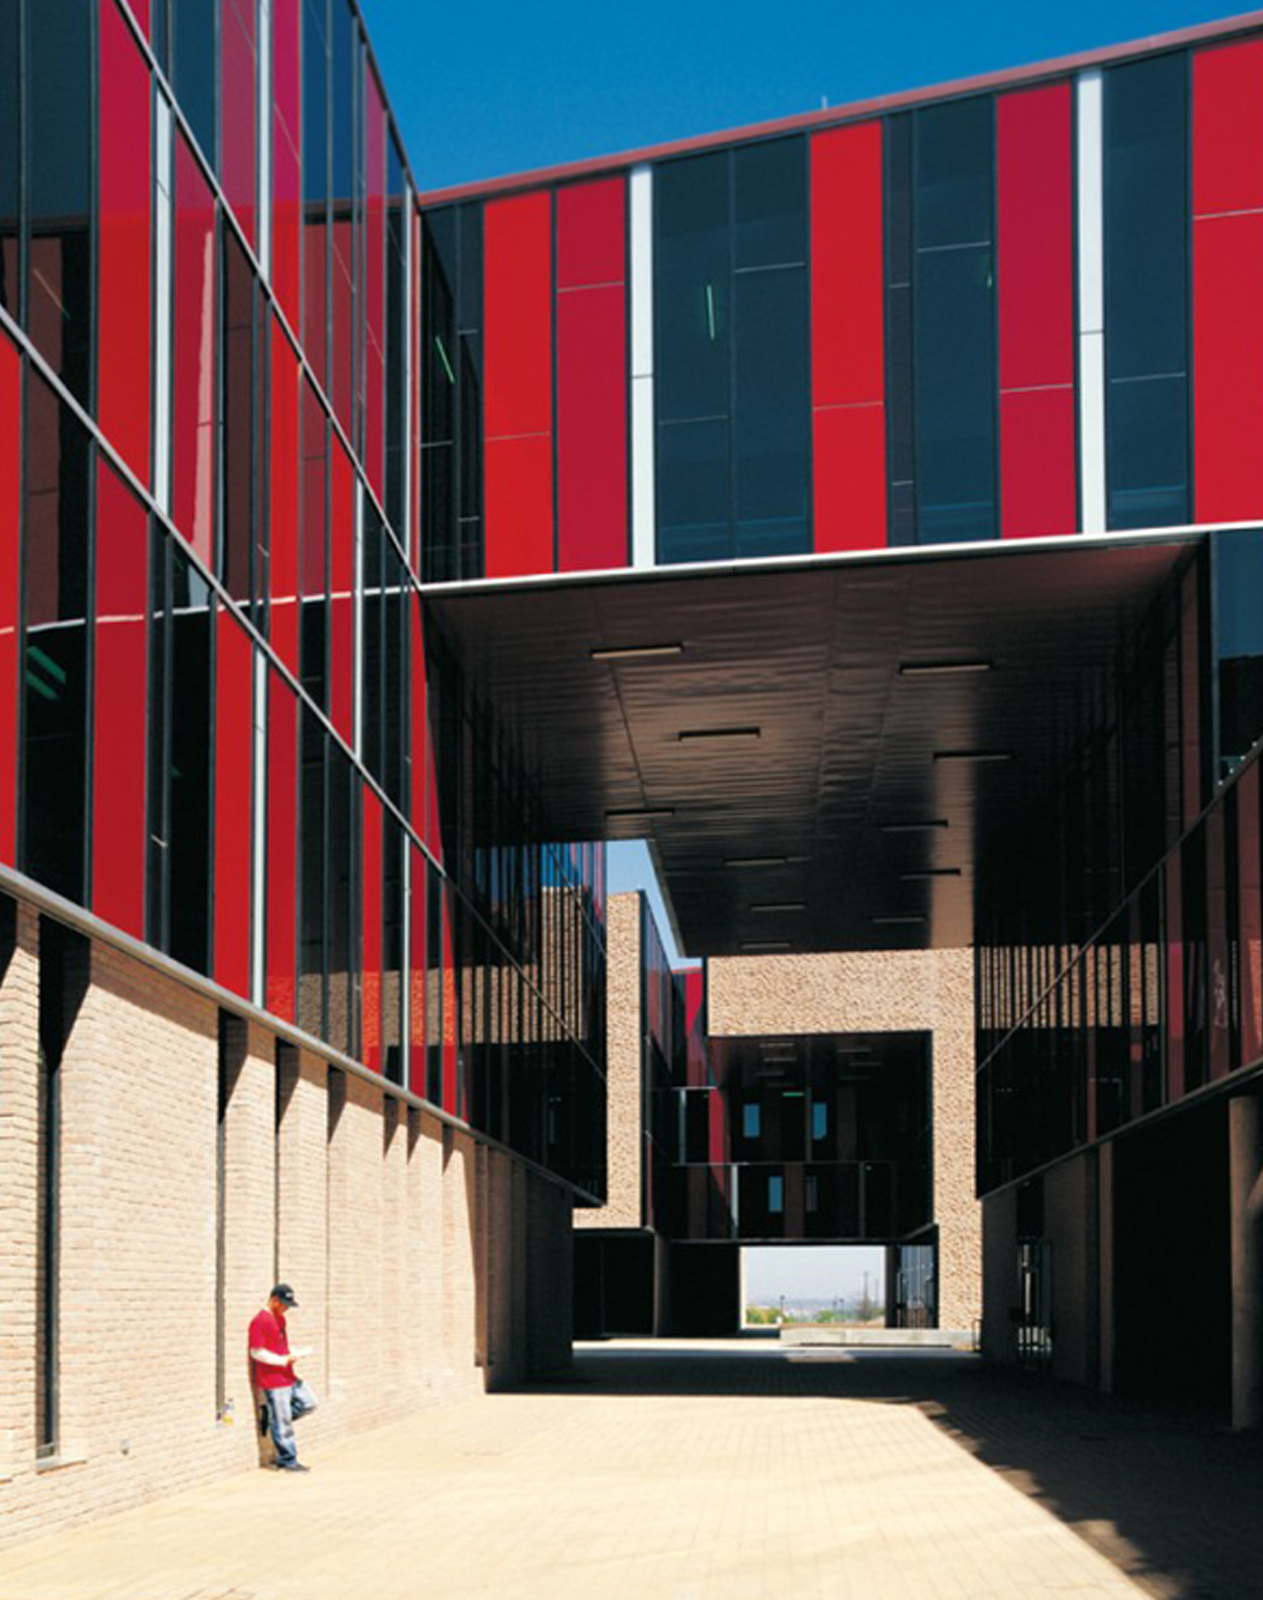 alejandro-aravena-premio-pritzke-arquitectura-2016-3